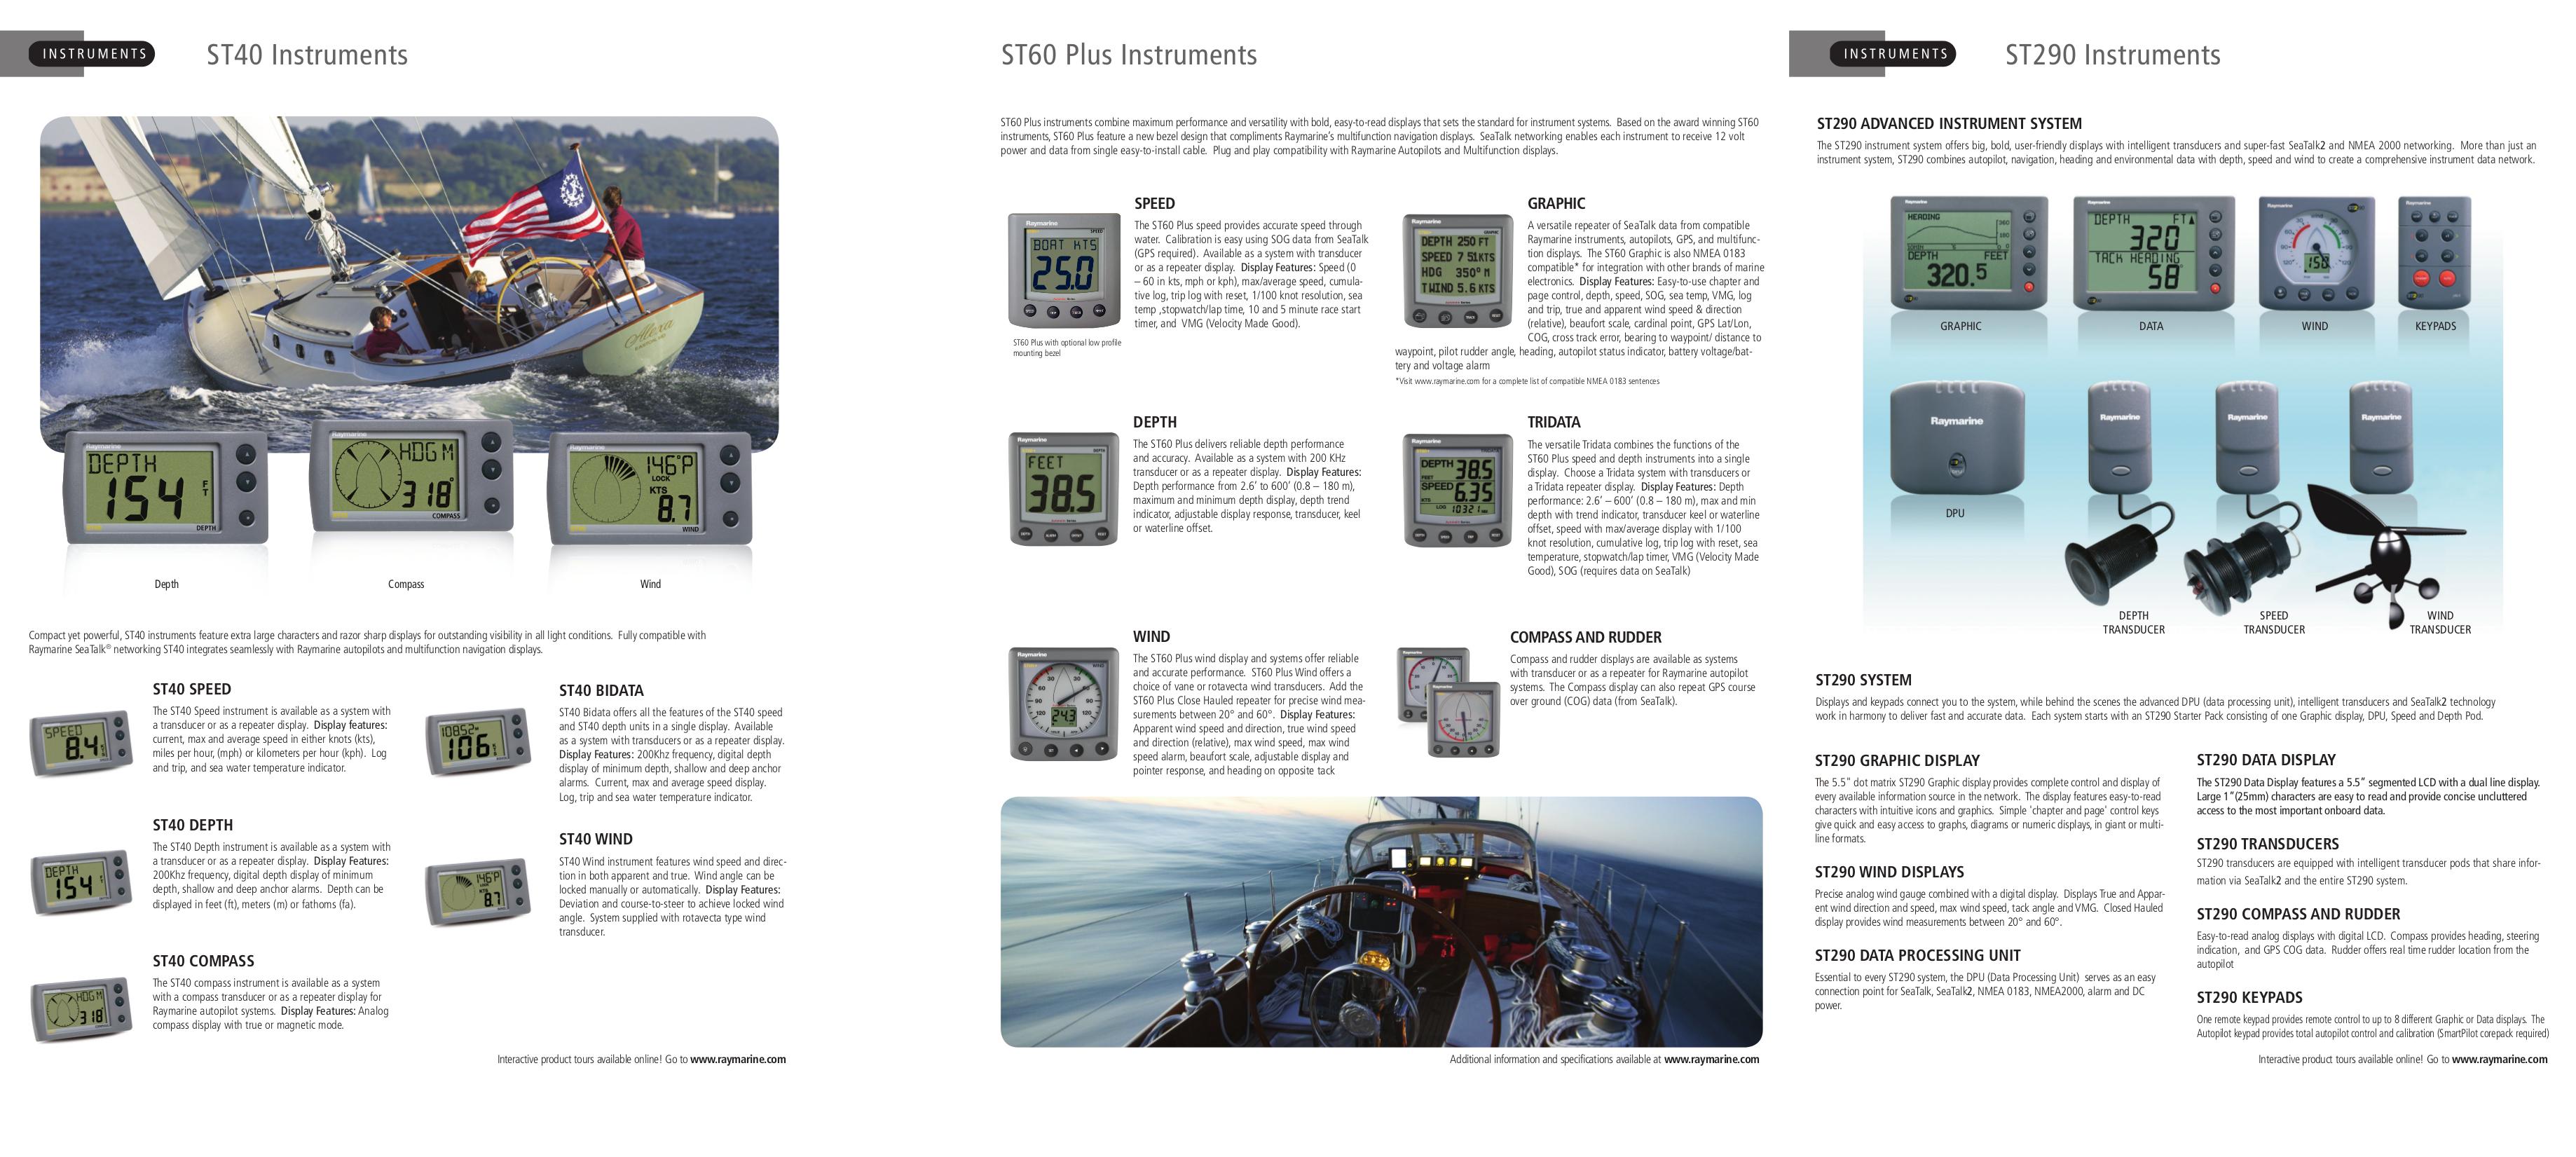 samsung galaxy s2 user manual pdf